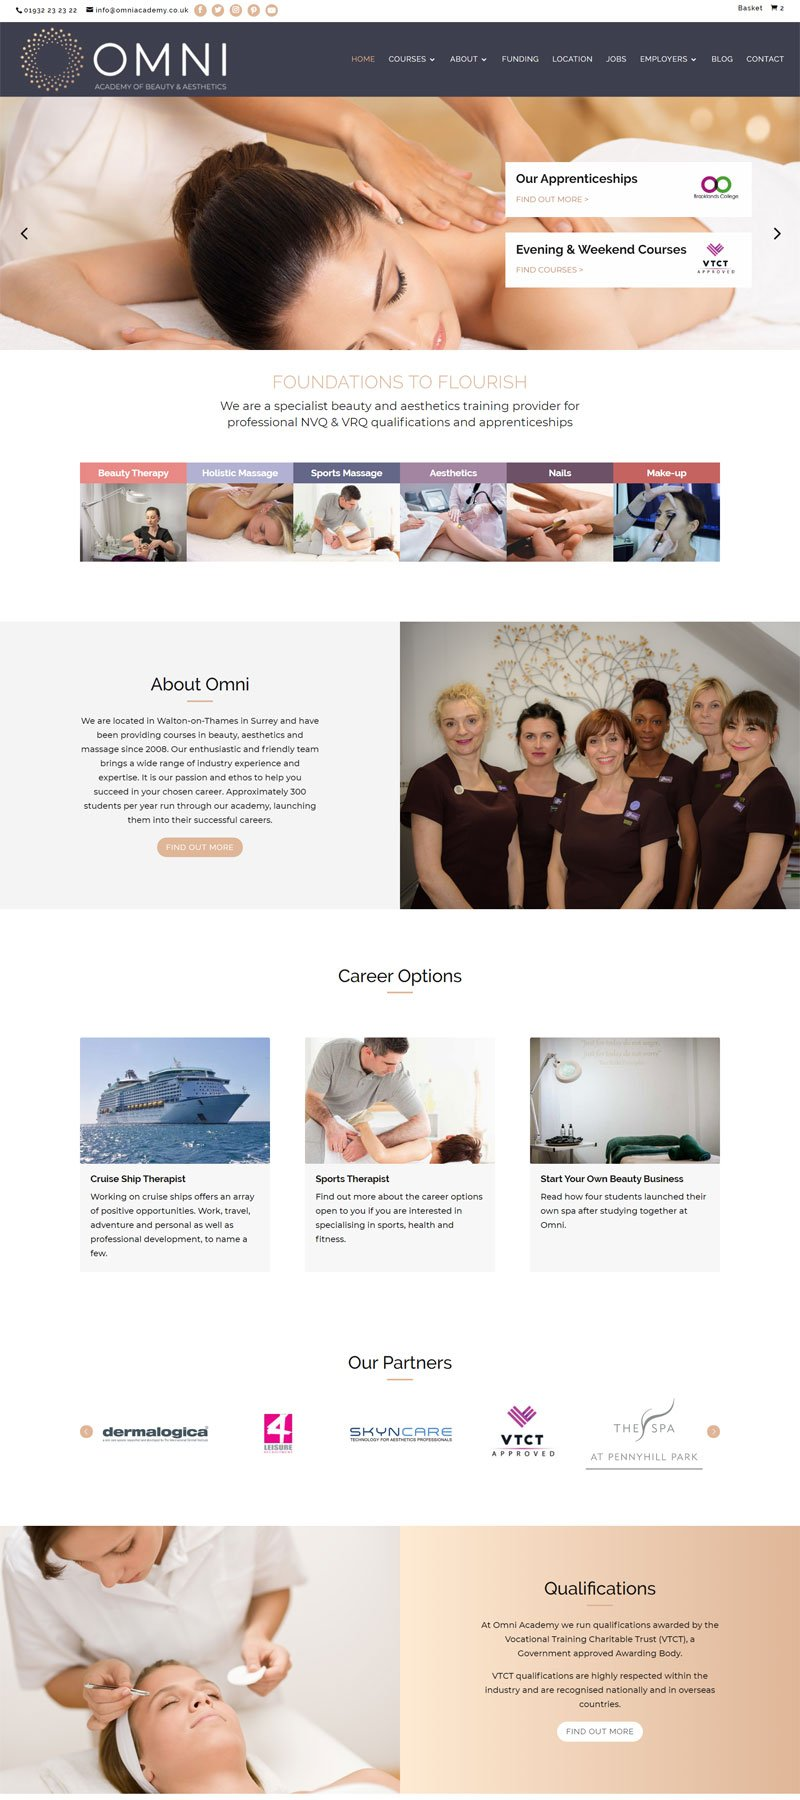 website design for omni academy of beauty by alpha pixa